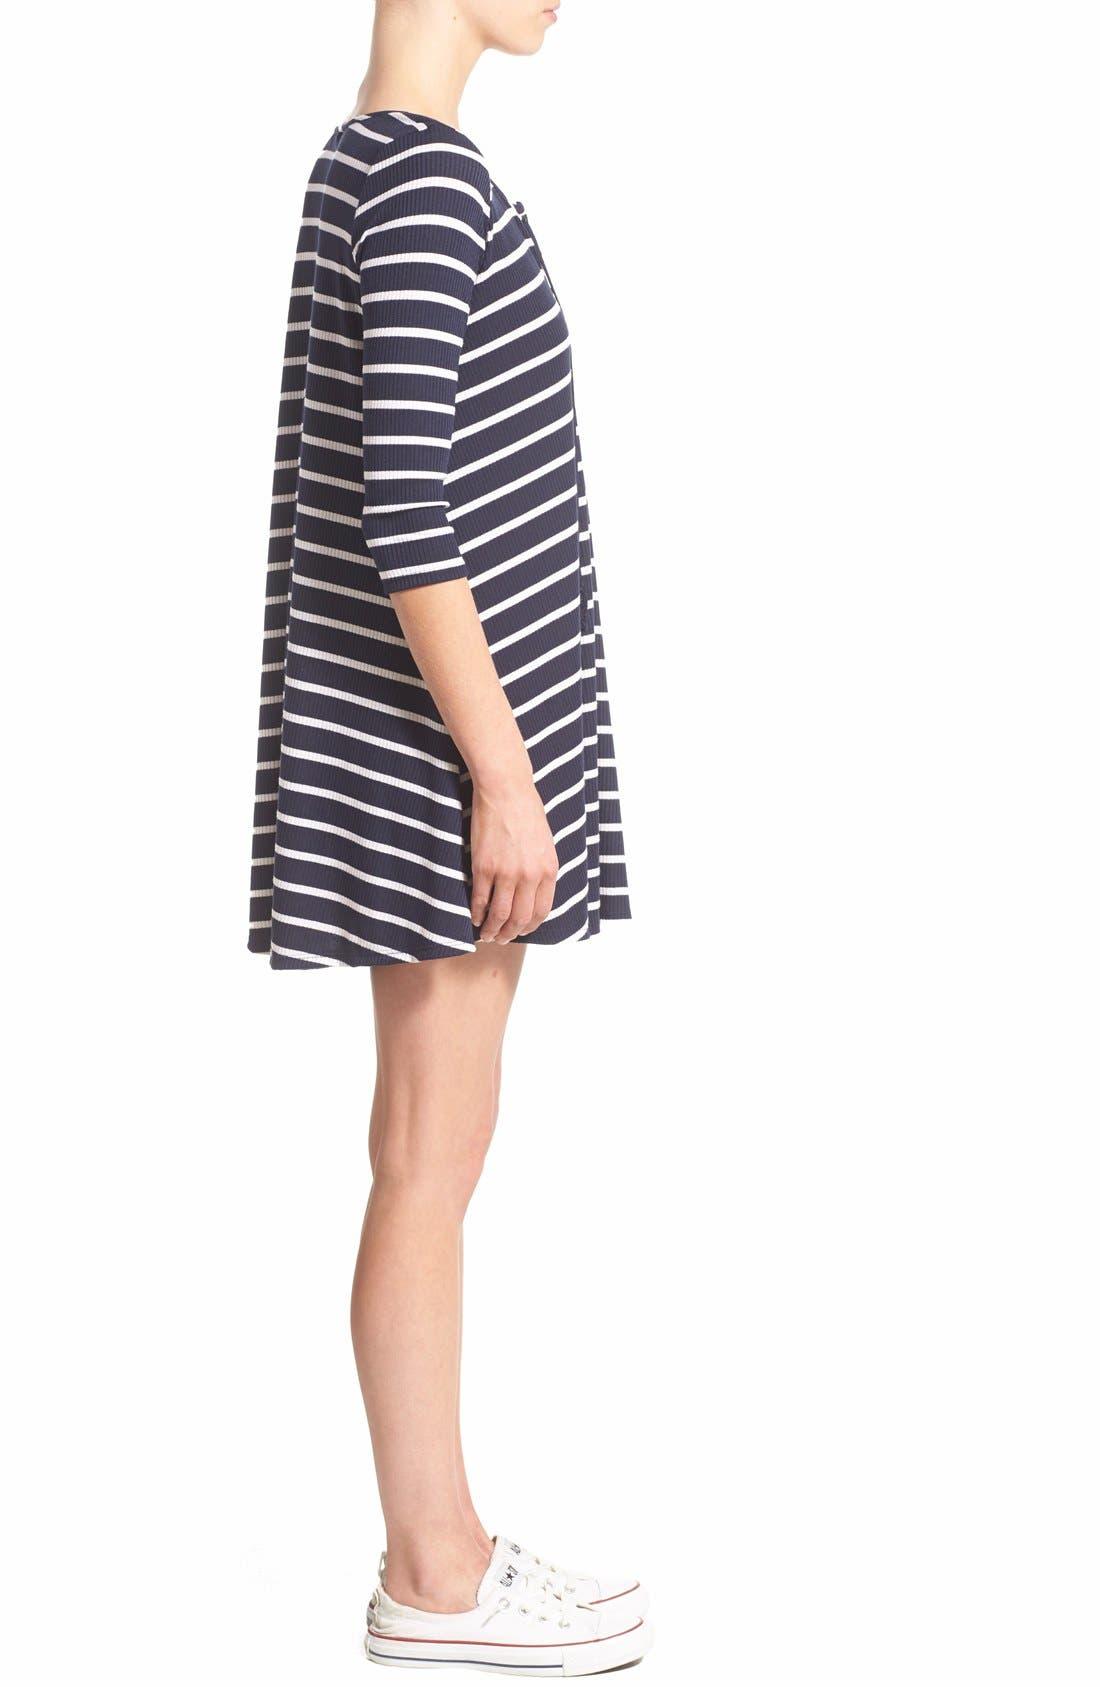 SOCIALITE, Stripe Lace-Up Minidress, Alternate thumbnail 2, color, 466